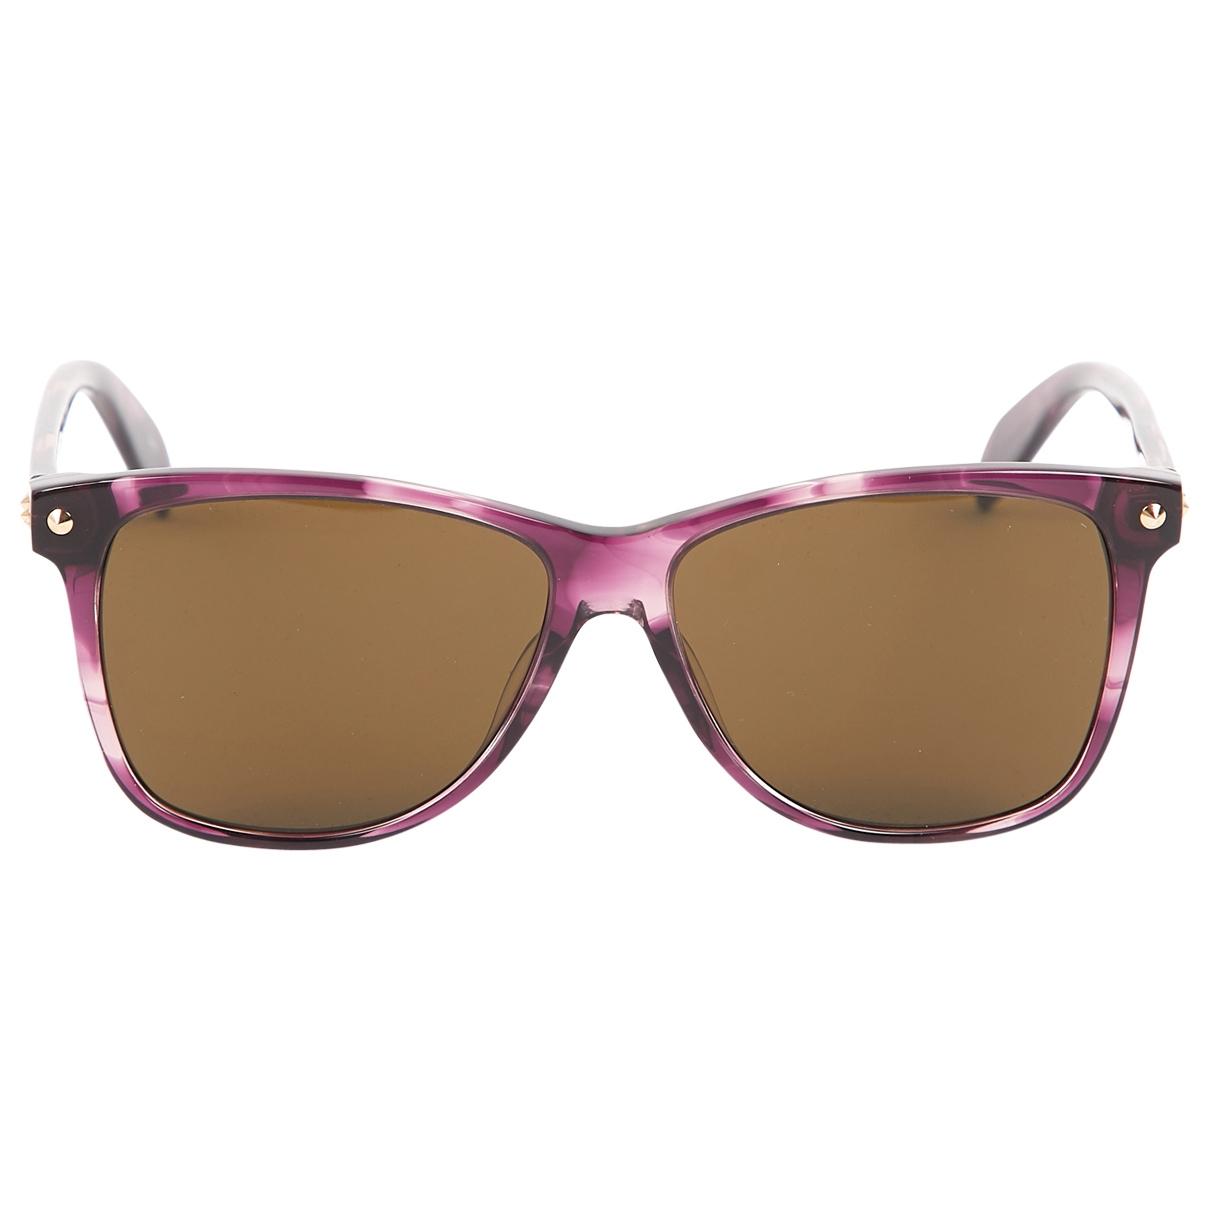 Alexander Mcqueen \N Purple Sunglasses for Women \N